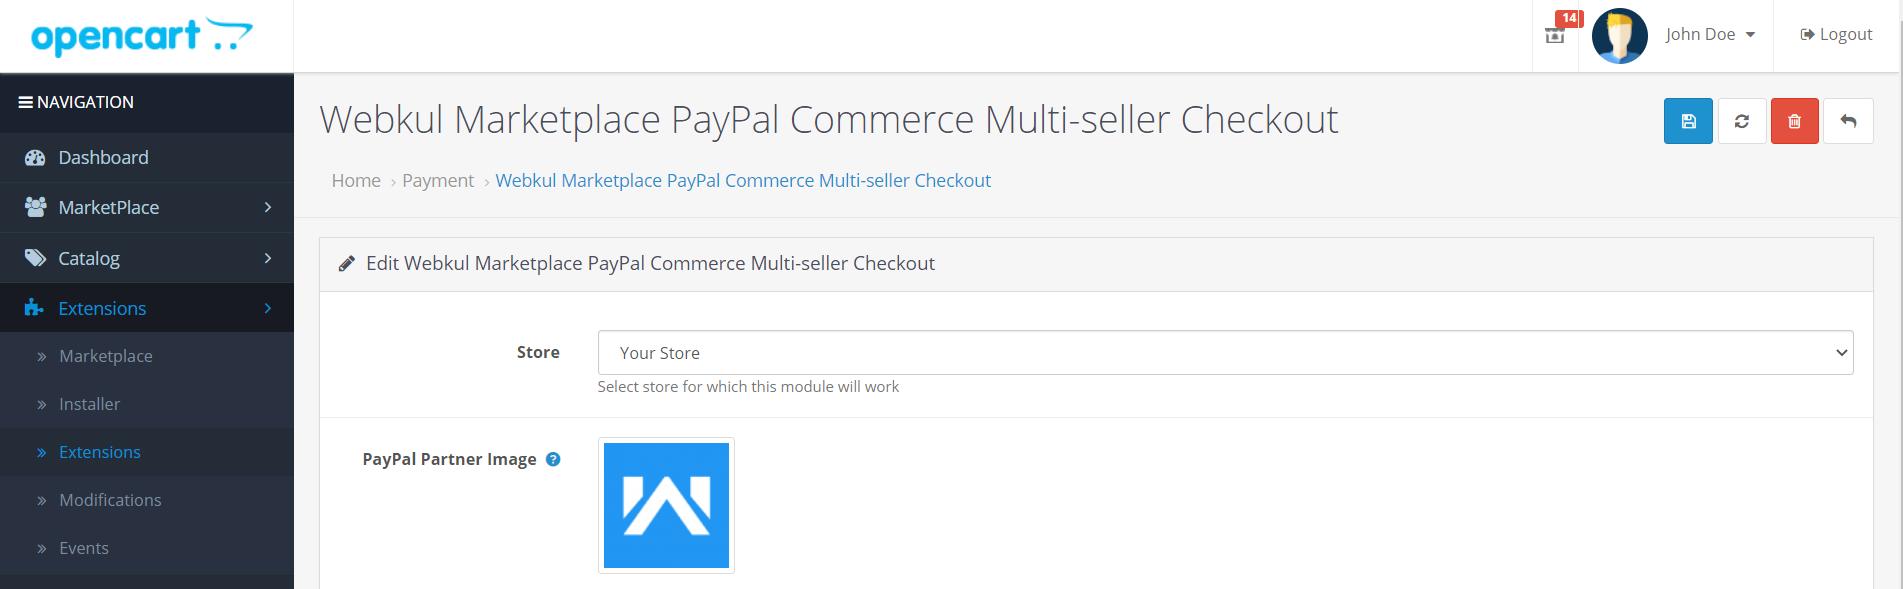 Webkul-Marketplace-PayPal-Commerce-Multi-seller